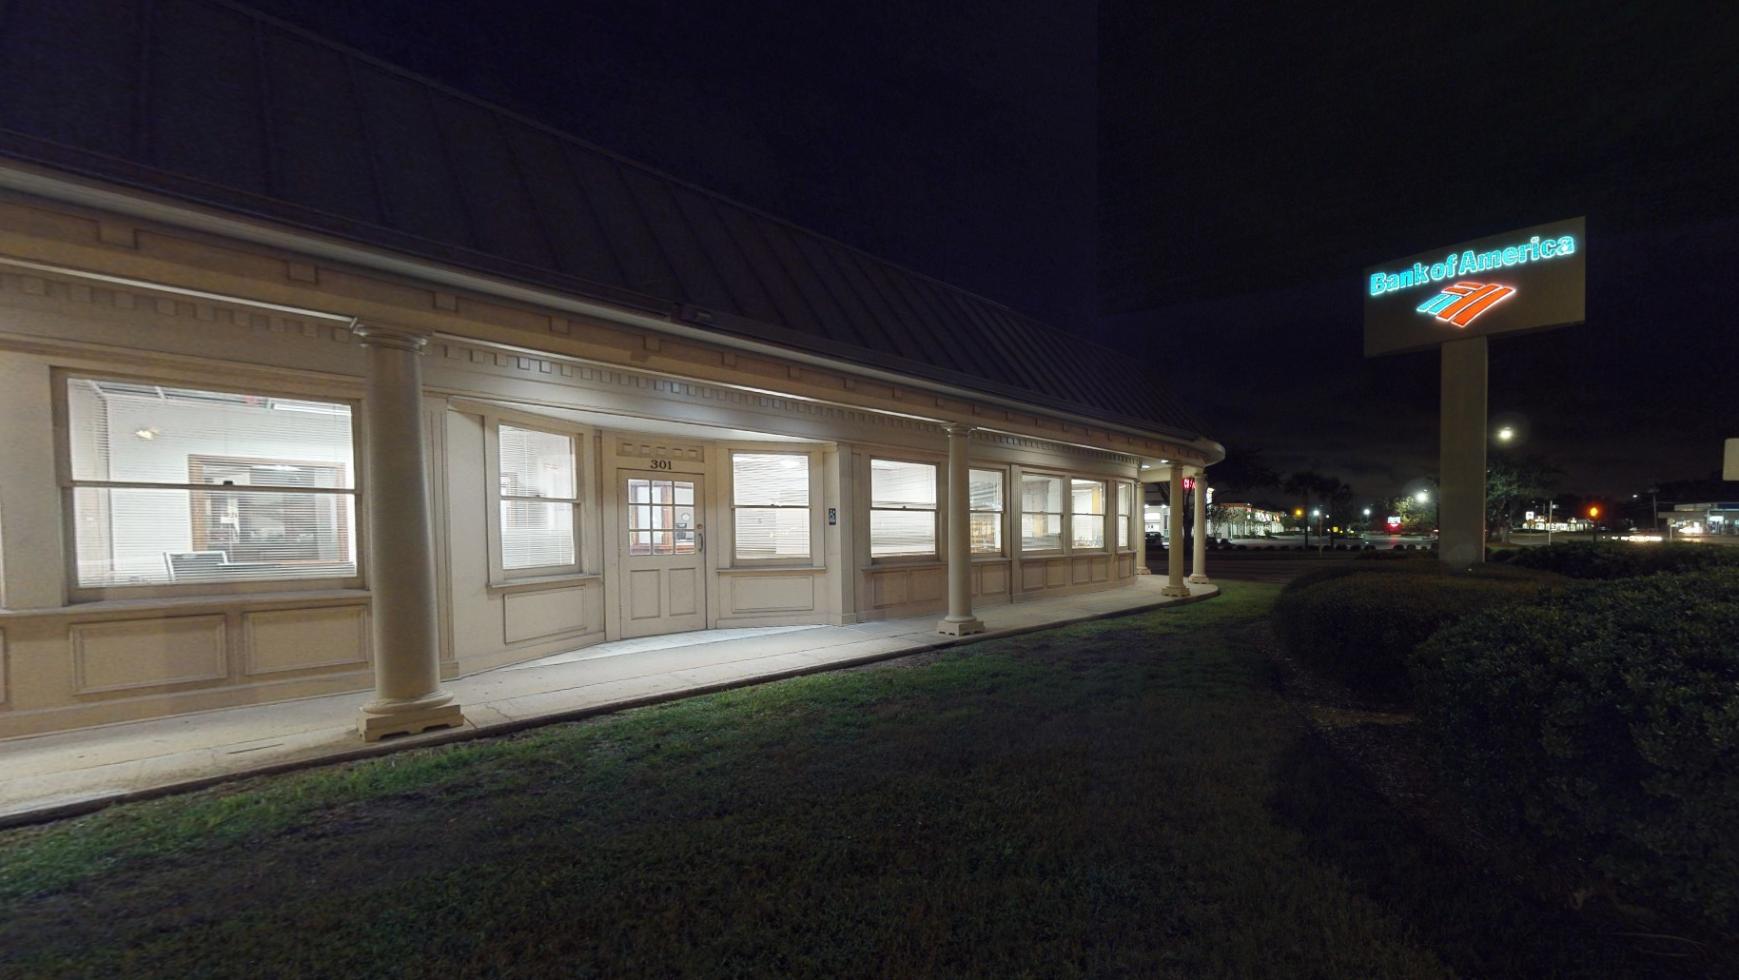 Bank of America financial center with drive-thru ATM   301 Gulf Breeze Pkwy, Gulf Breeze, FL 32561